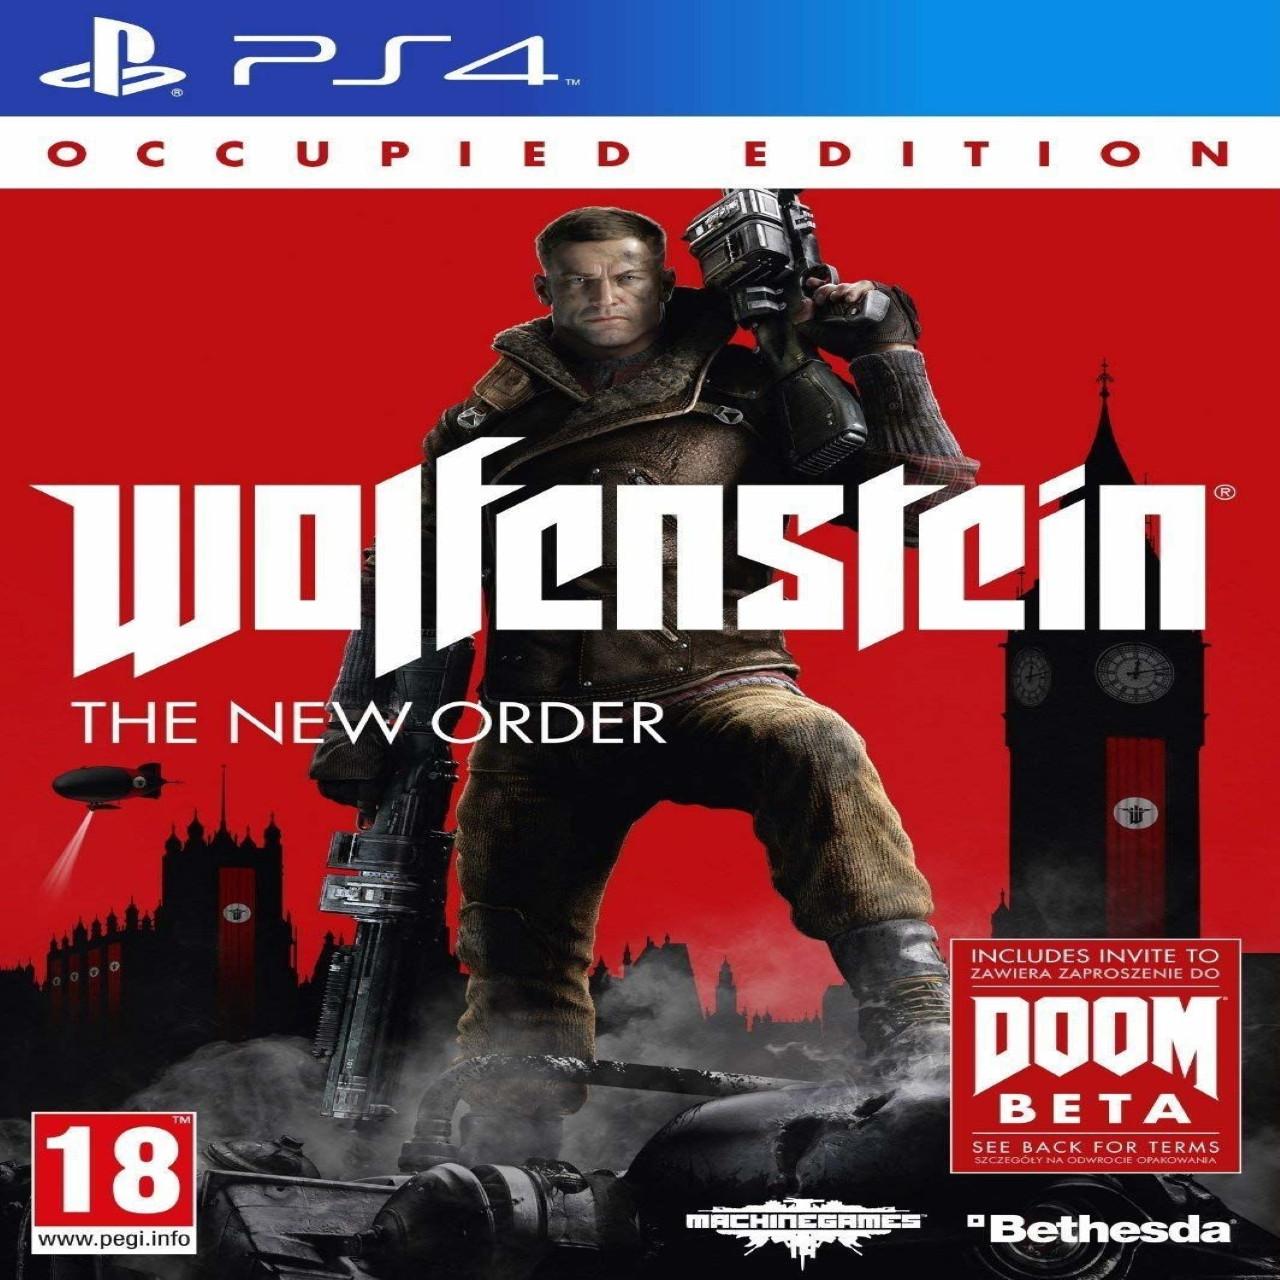 Wolfenstein: The New Order. Occupied Edition (російські субтитри) PS4